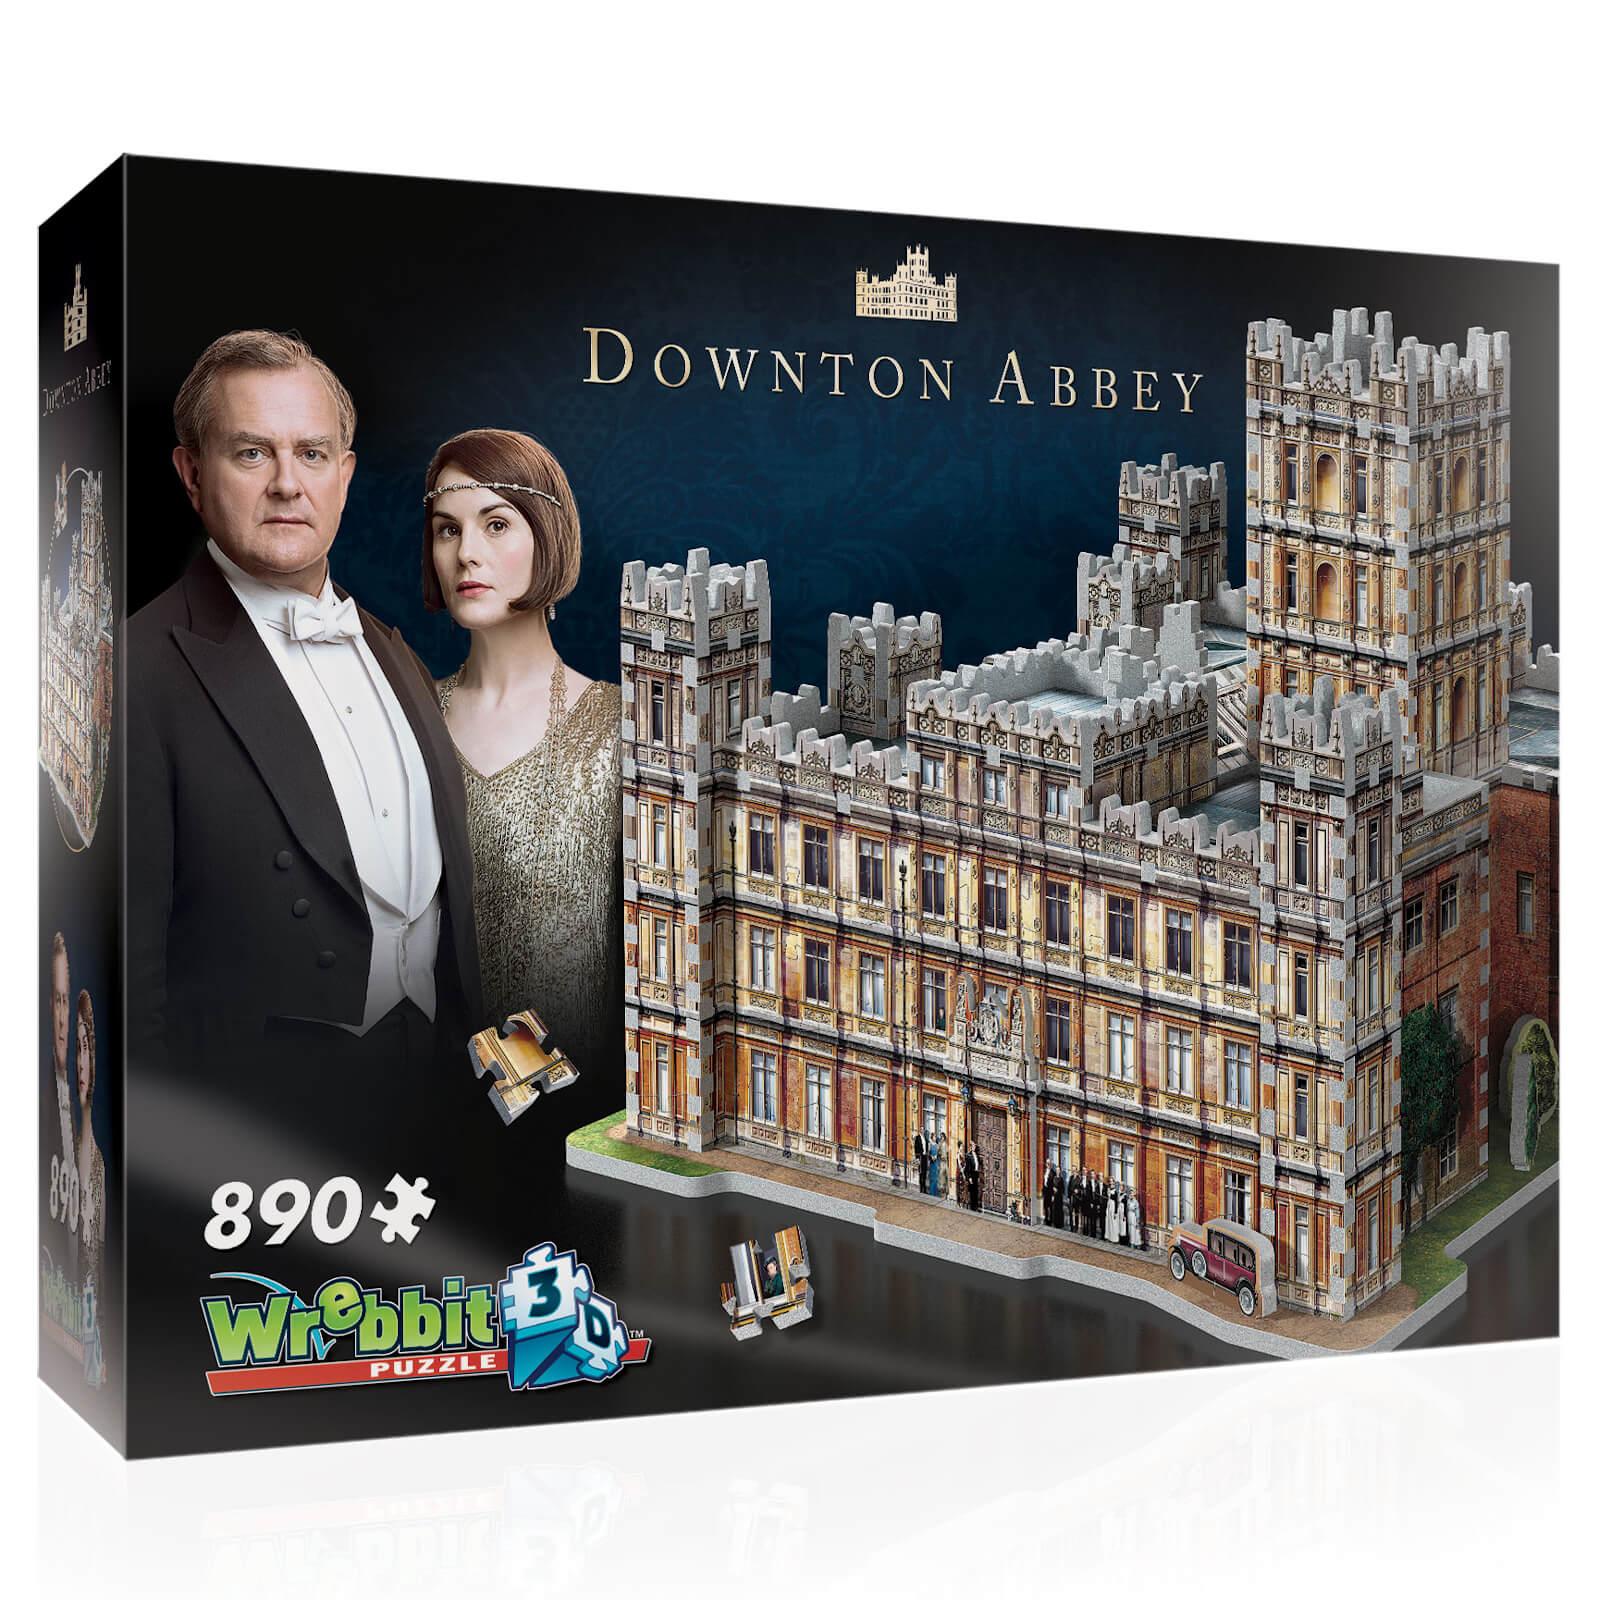 Image of Downton Abbey 3D Puzzle (890 Pieces)